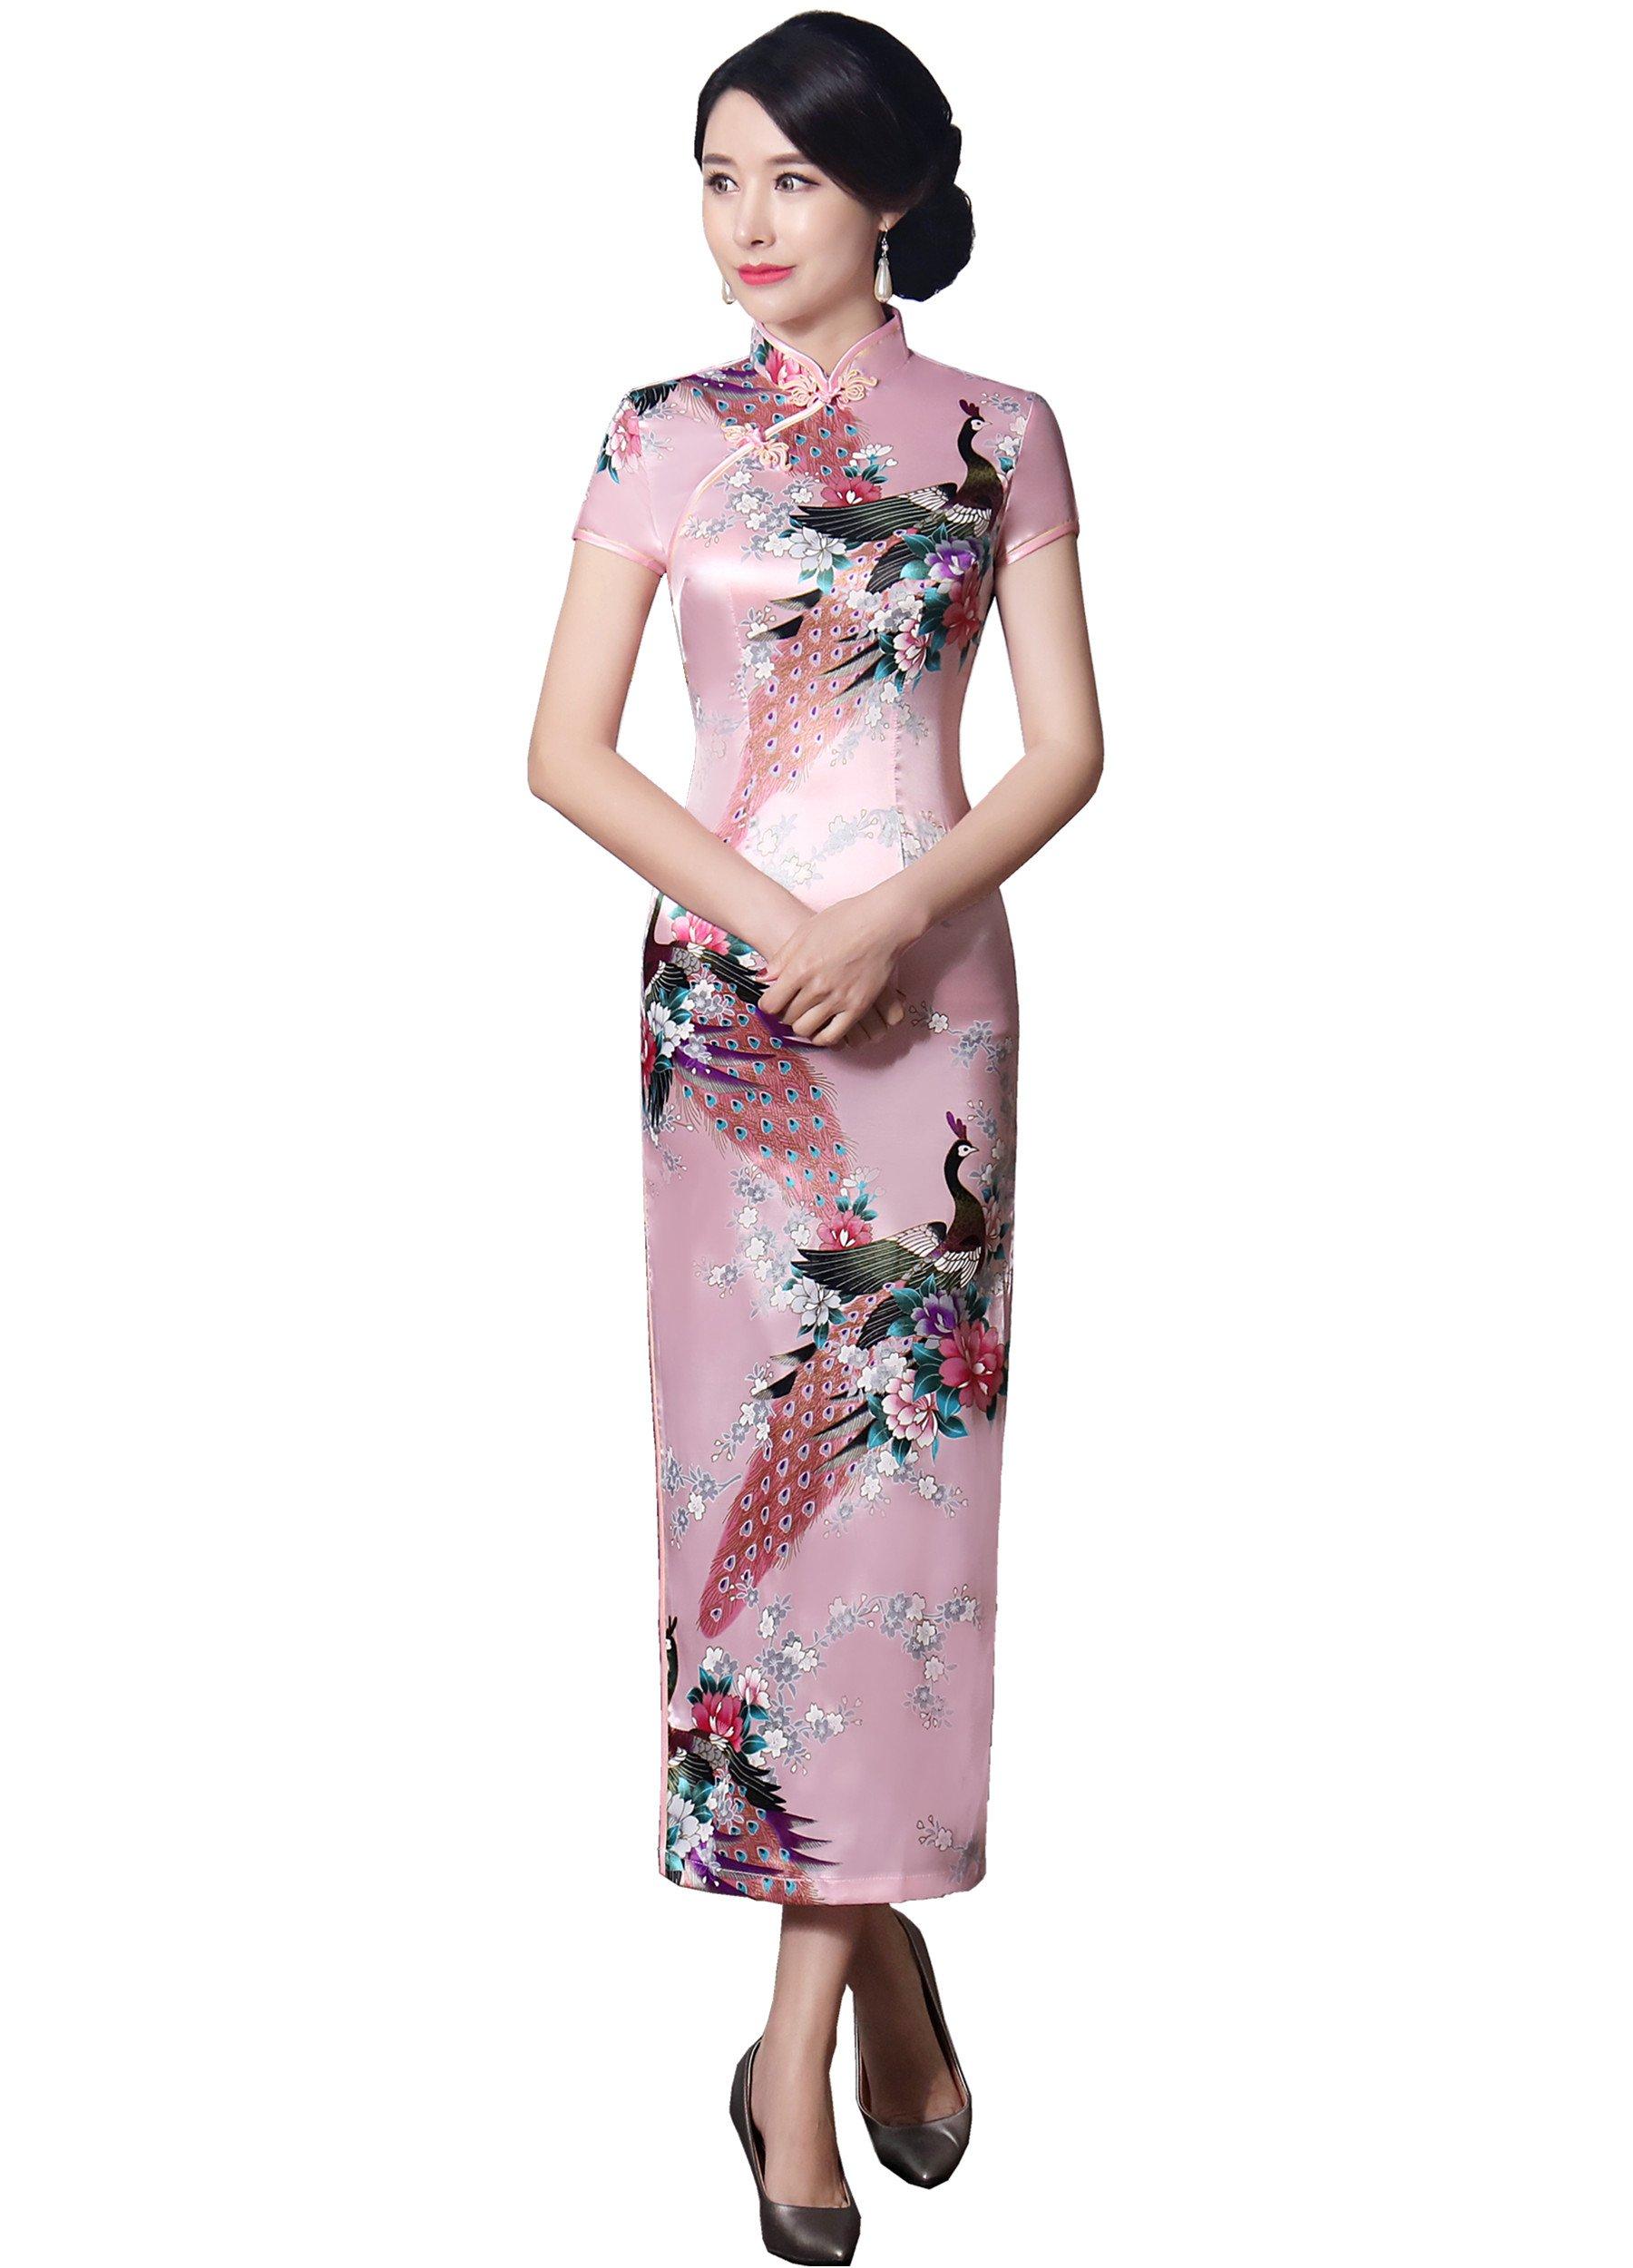 Shanghai Story Short Sleeve Peacock Print Cheongsam Long Qipao Dress XL Pink